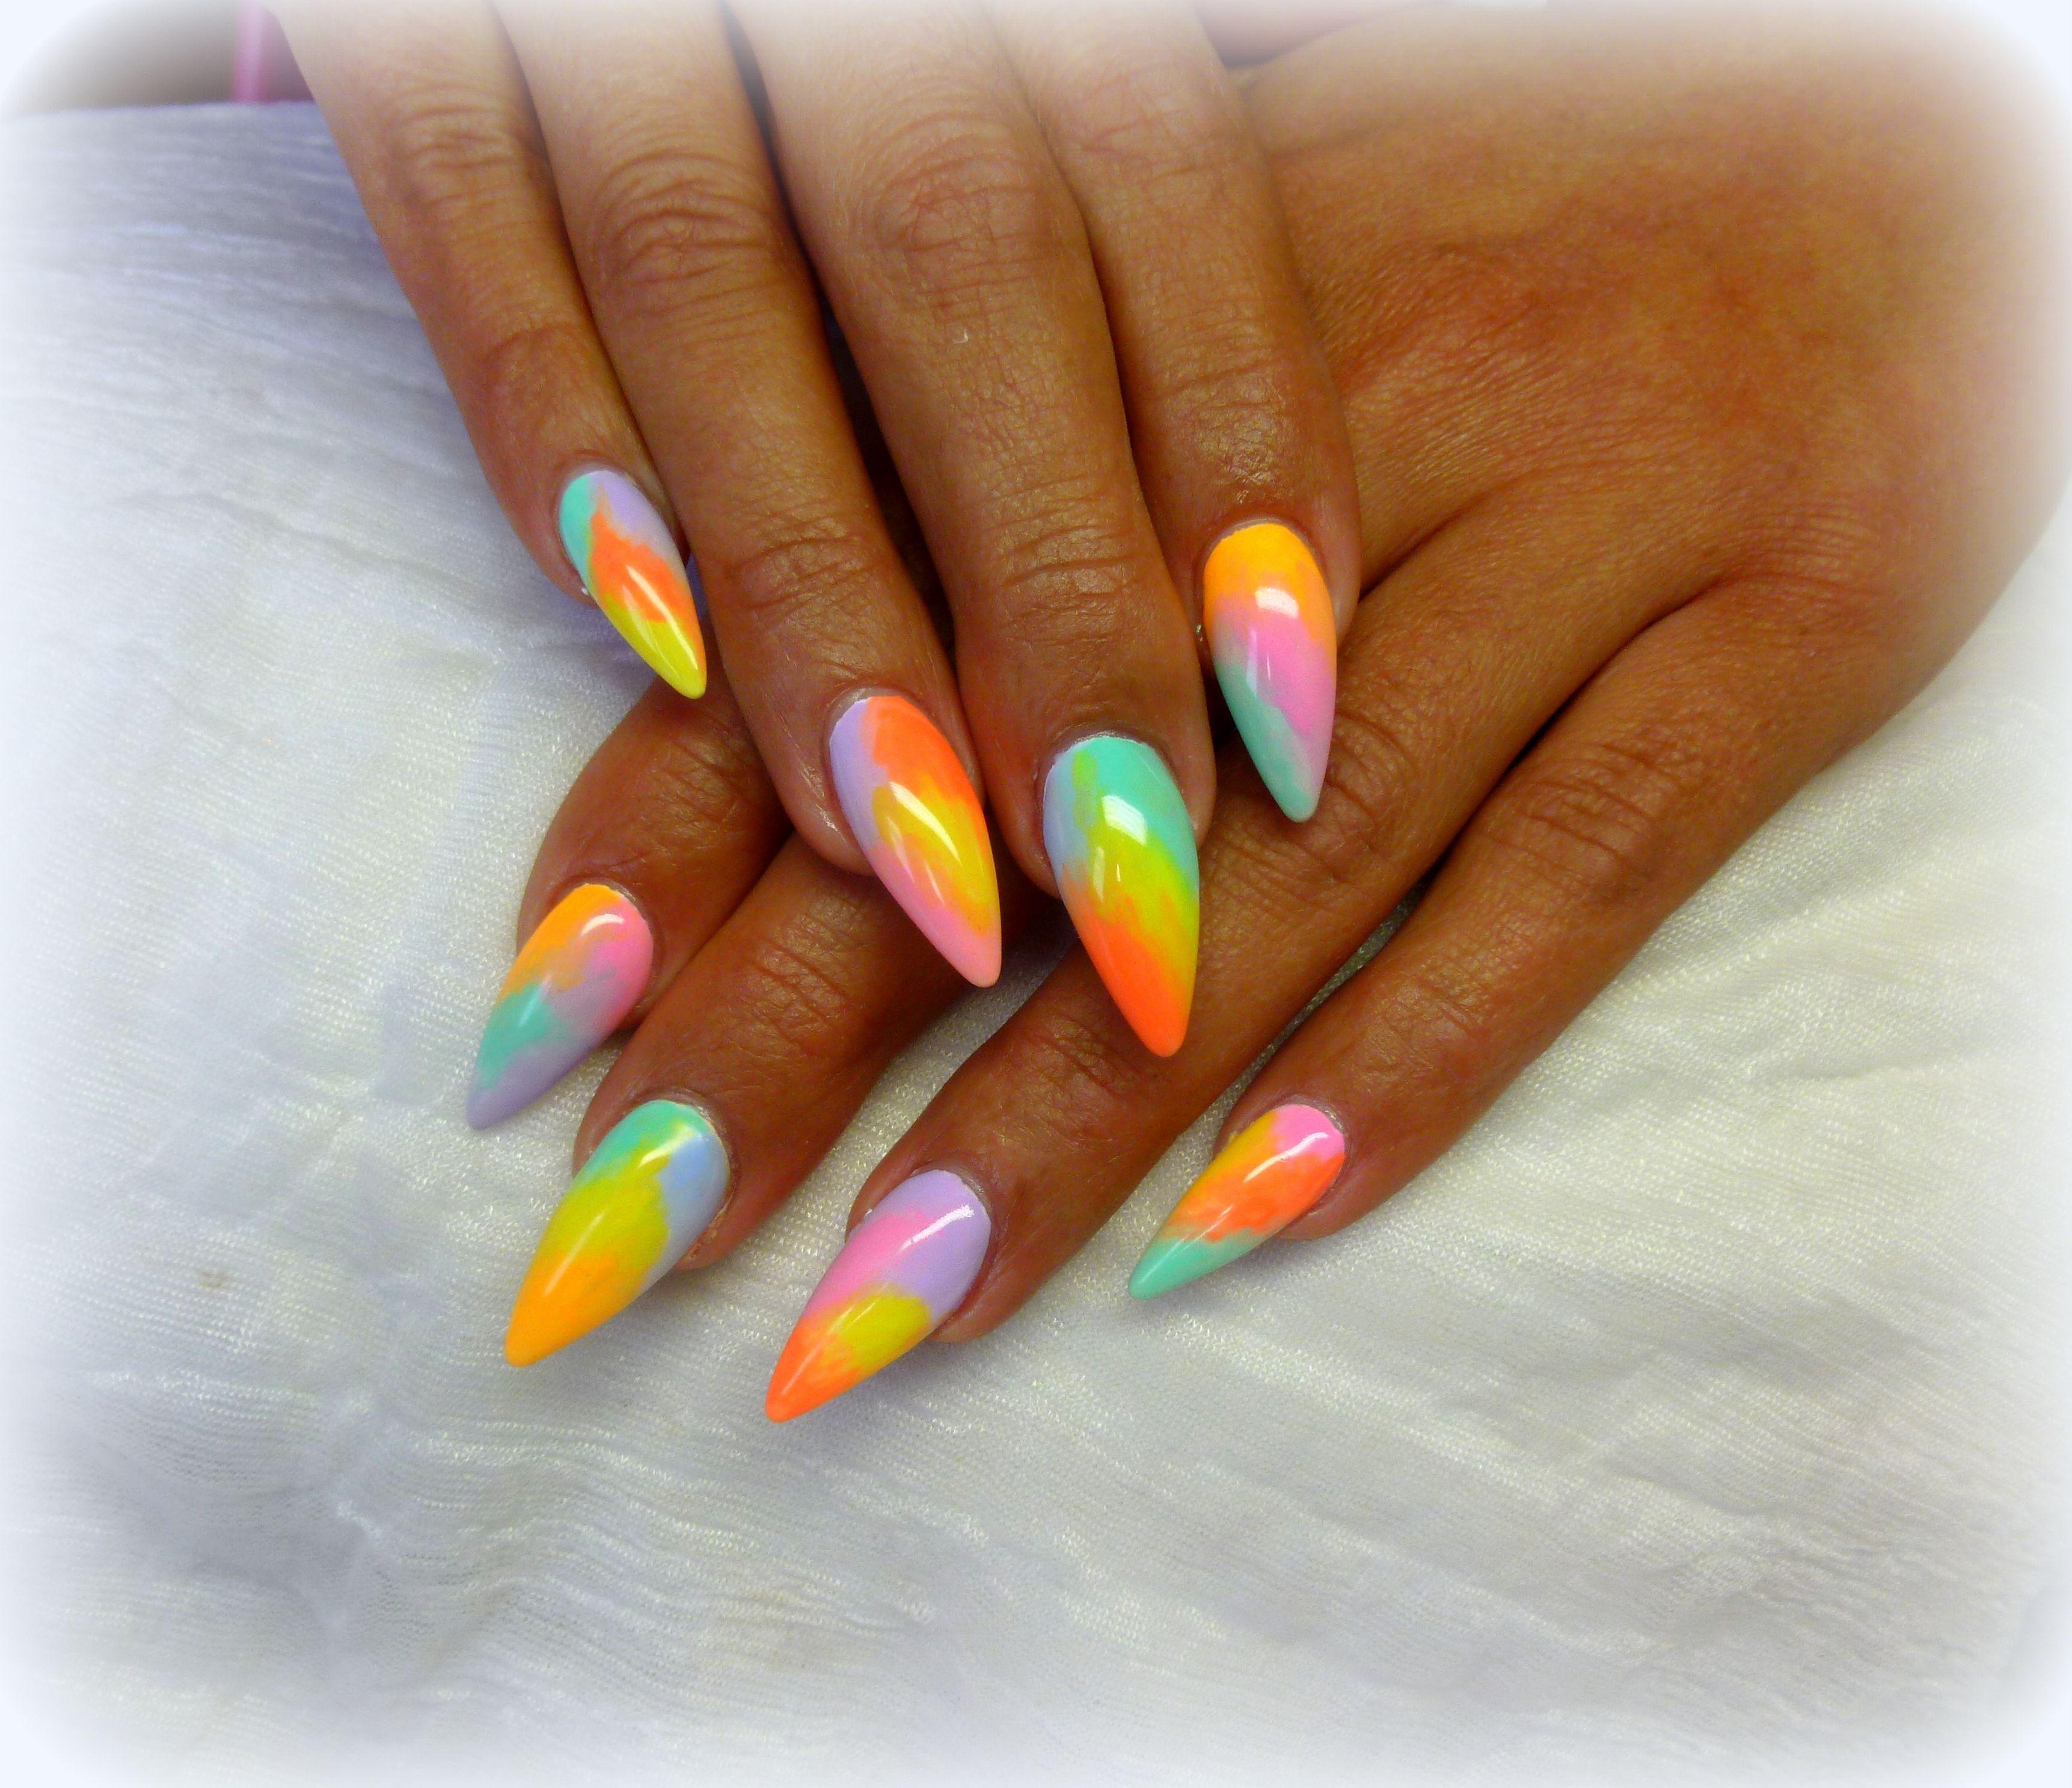 Stiletto Nails With Images Neonove Nehty Barevne Nehty Gelove Nehty